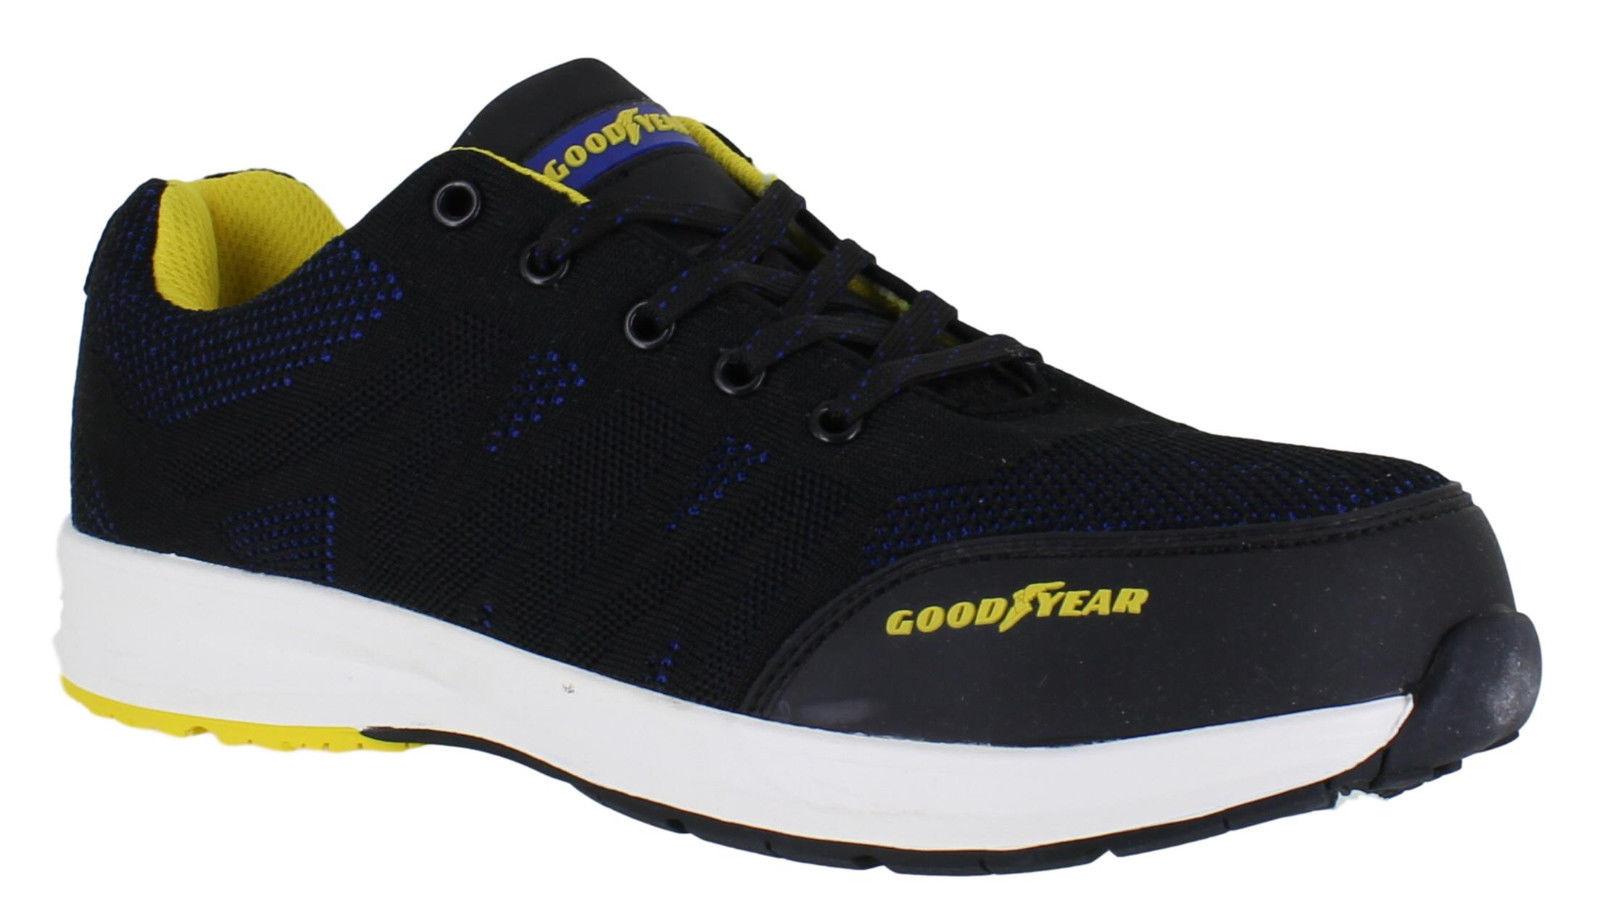 Mens WILDCAT S1P Lightweight Safety Composite Toe Cap Midsole Trainer Boots Size